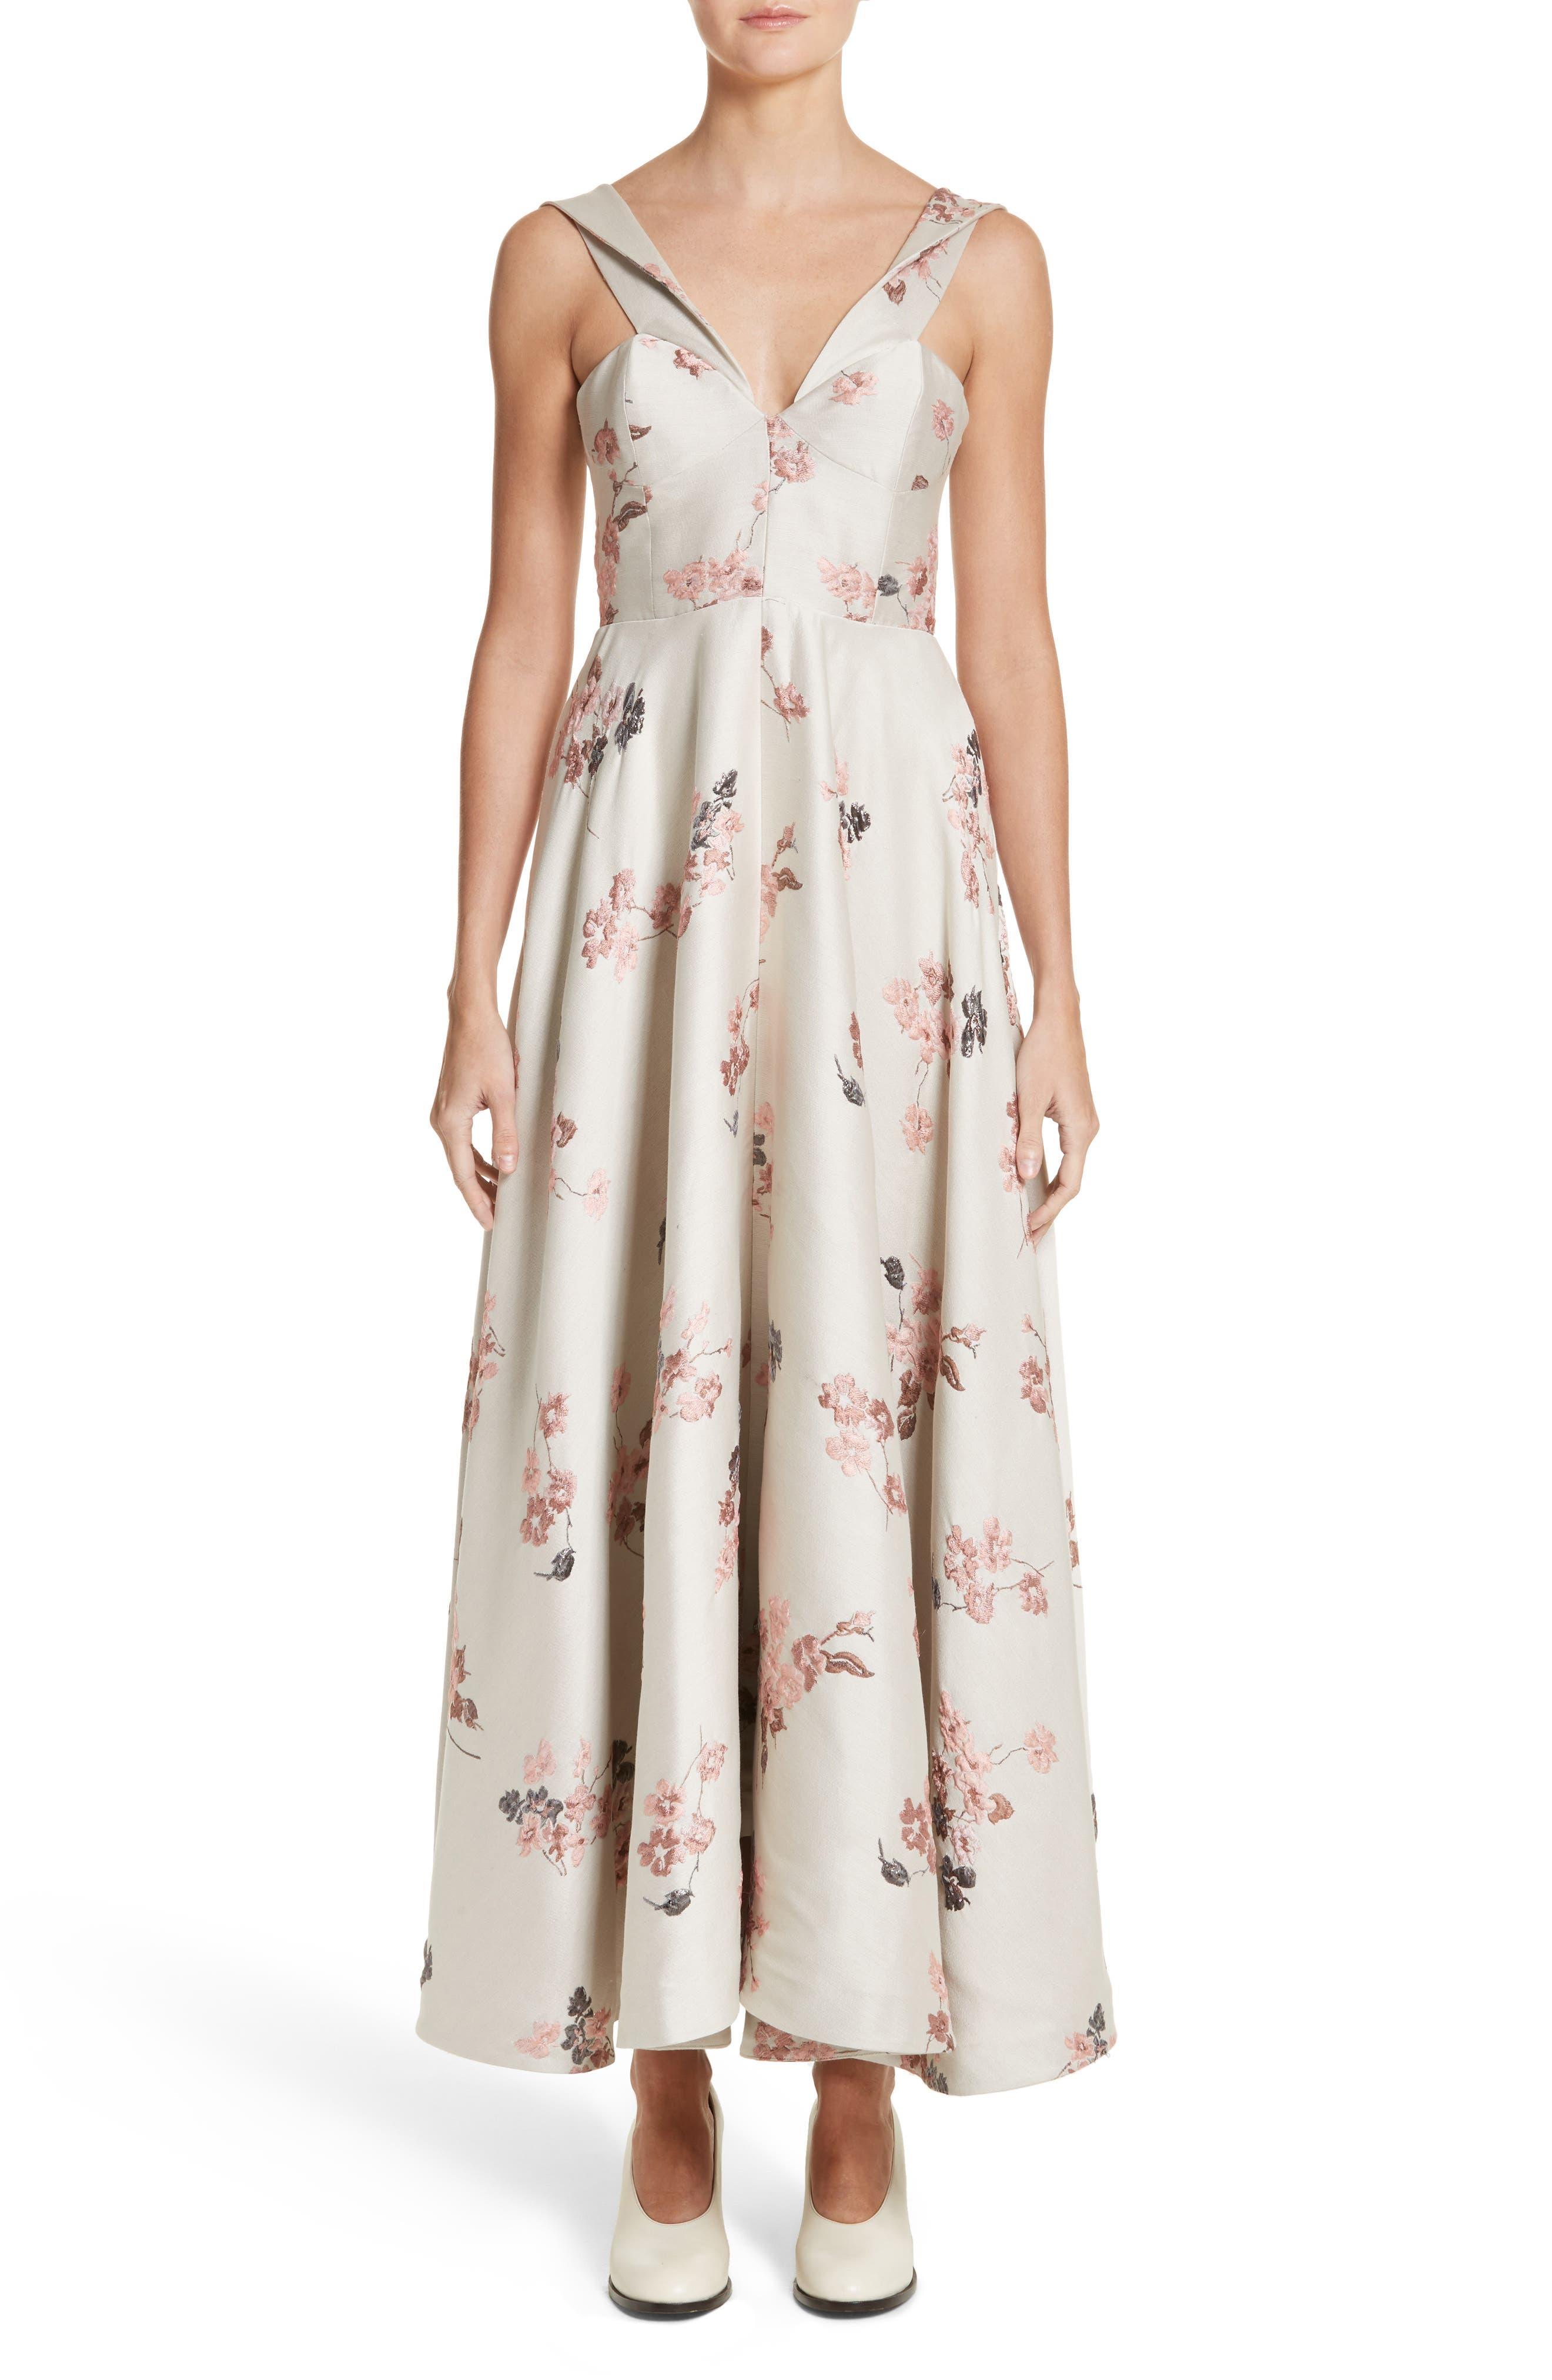 Co Metallic Floral Jacquard Dress